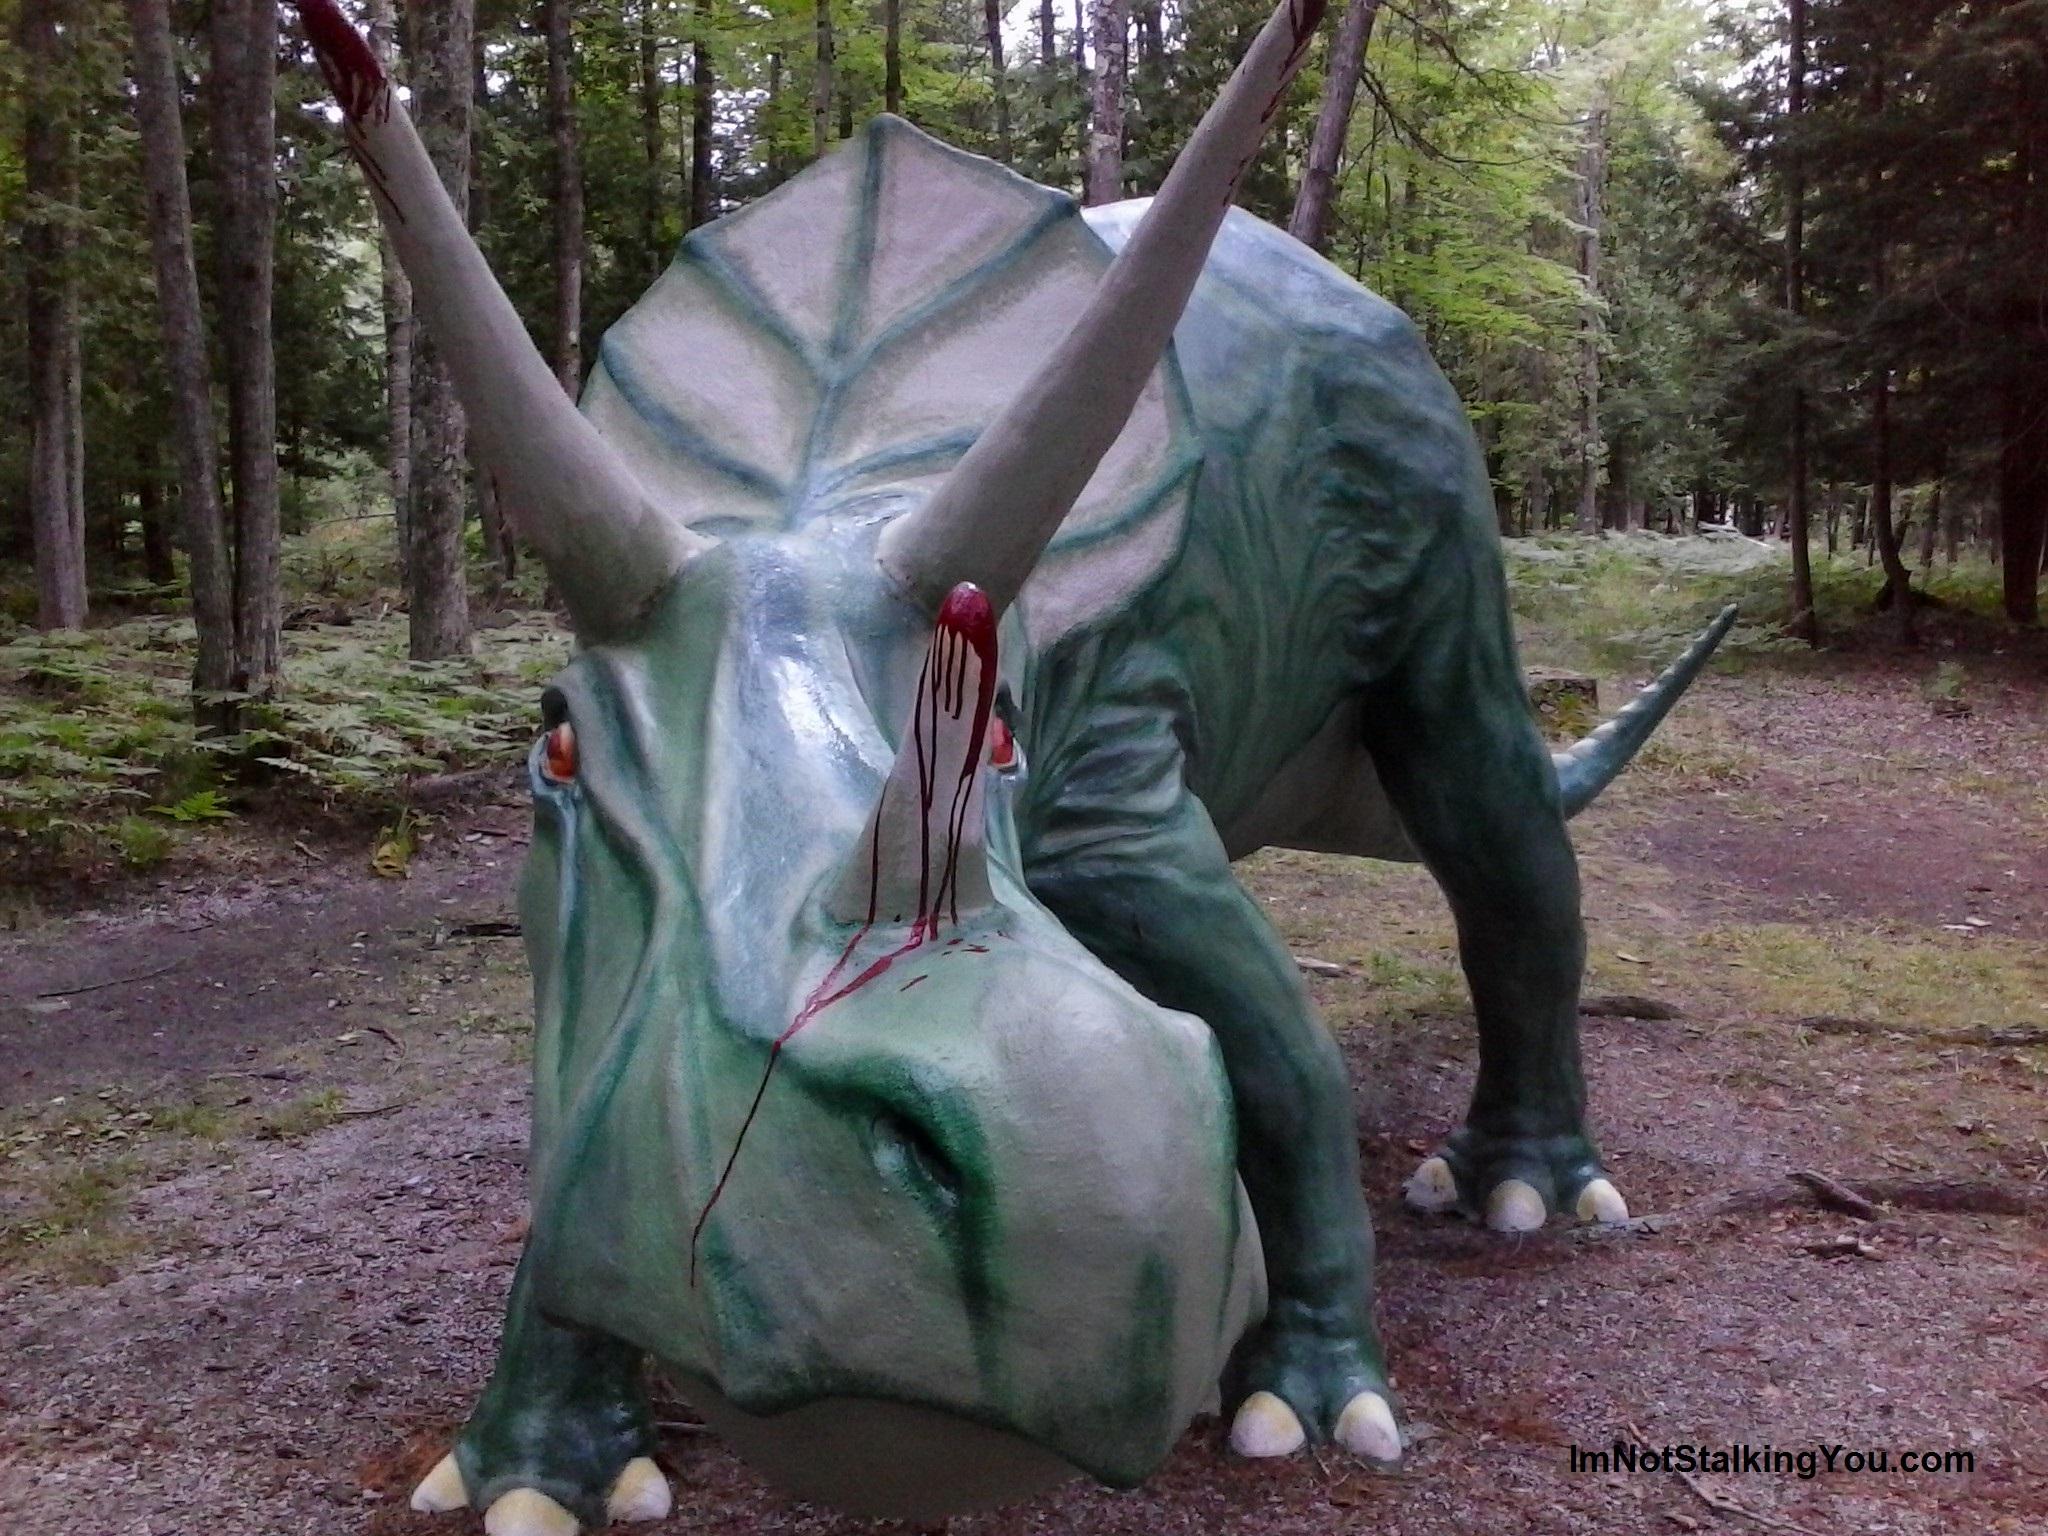 Dinosaur Gardens Im not stalking you